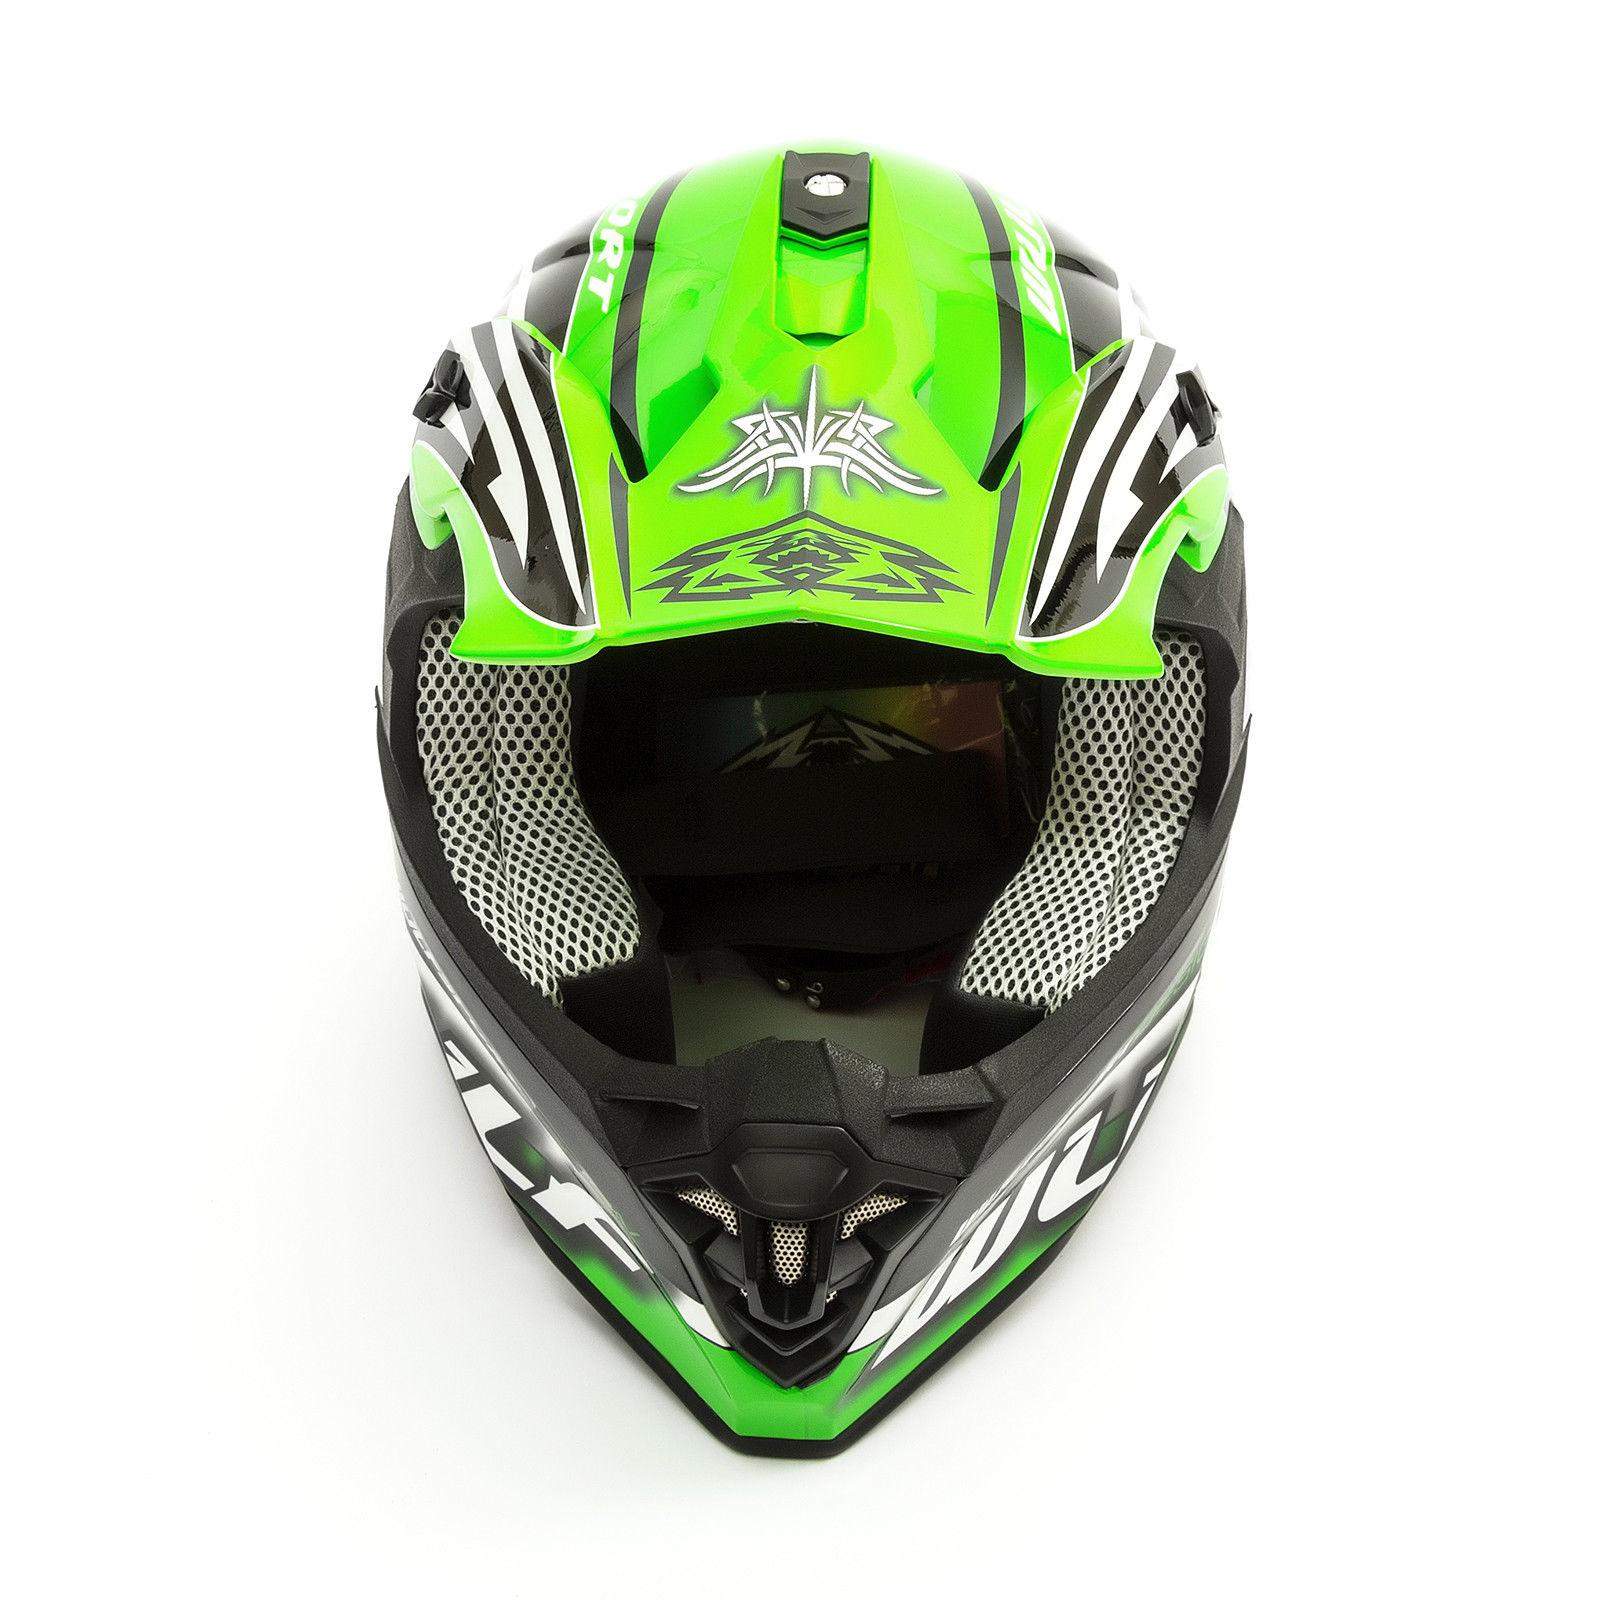 Wulfsport-Adult-Sceptre-Helmets-Motocross-Pitbike-Motorbike-Off-Road-Racing-ATV thumbnail 70